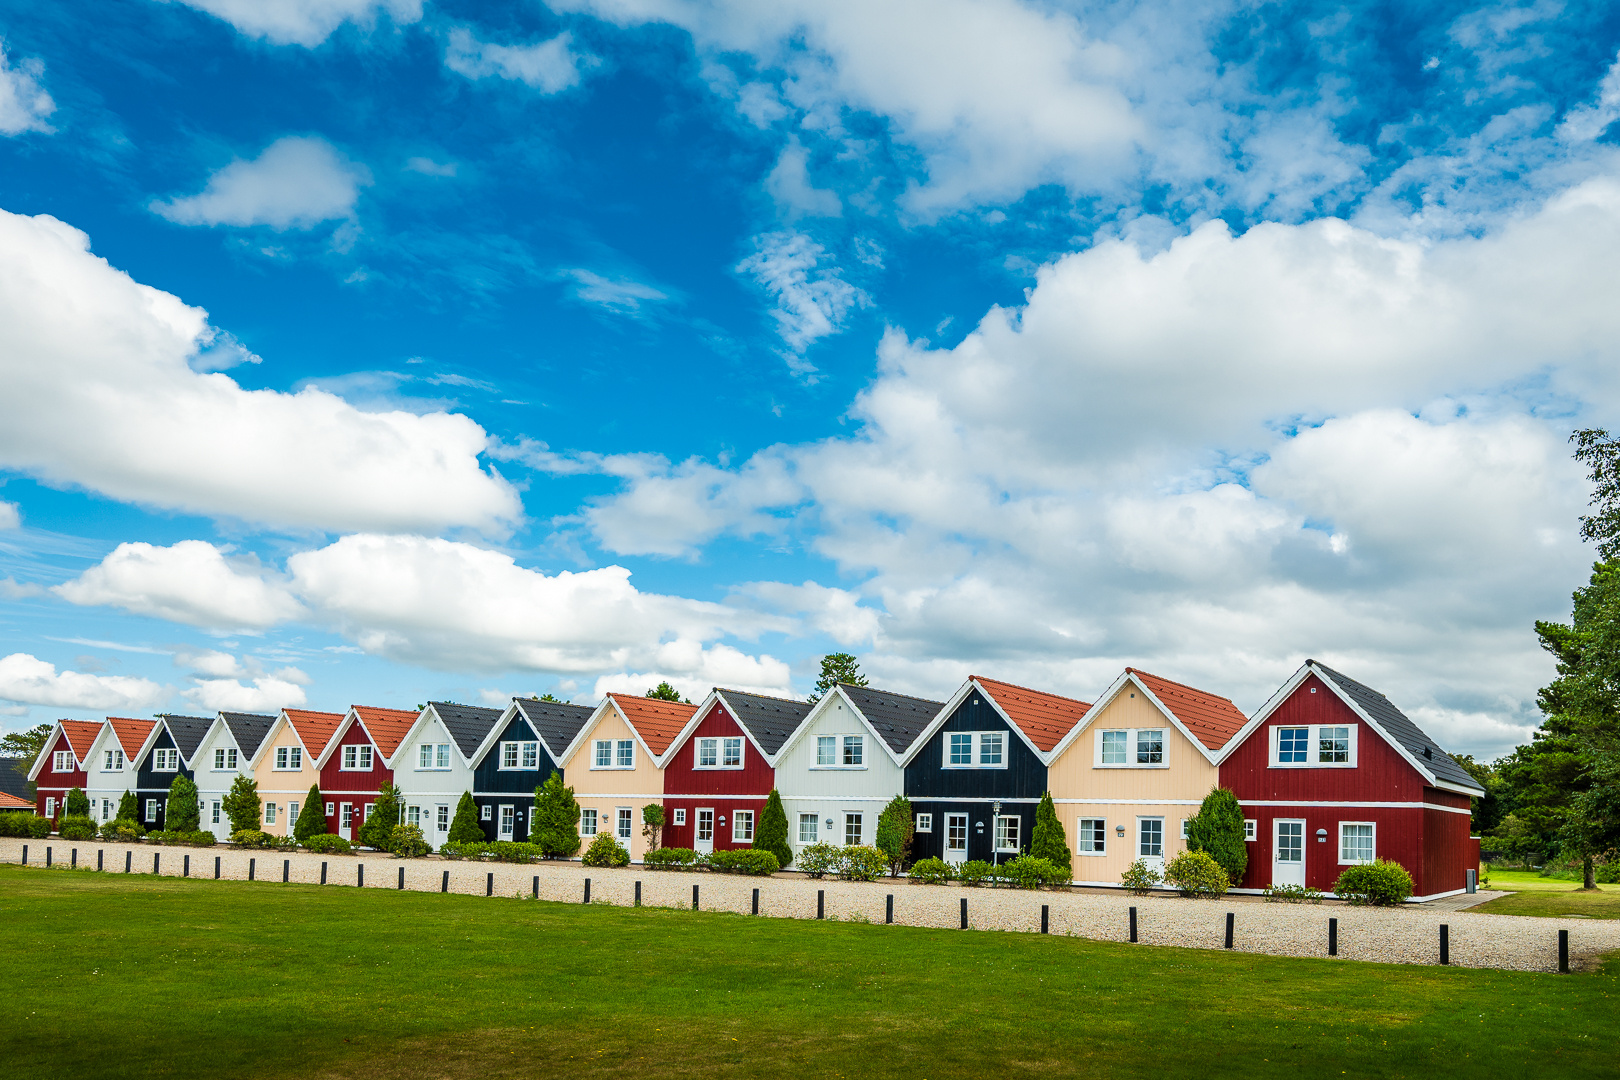 Häuserfront in Dänemark